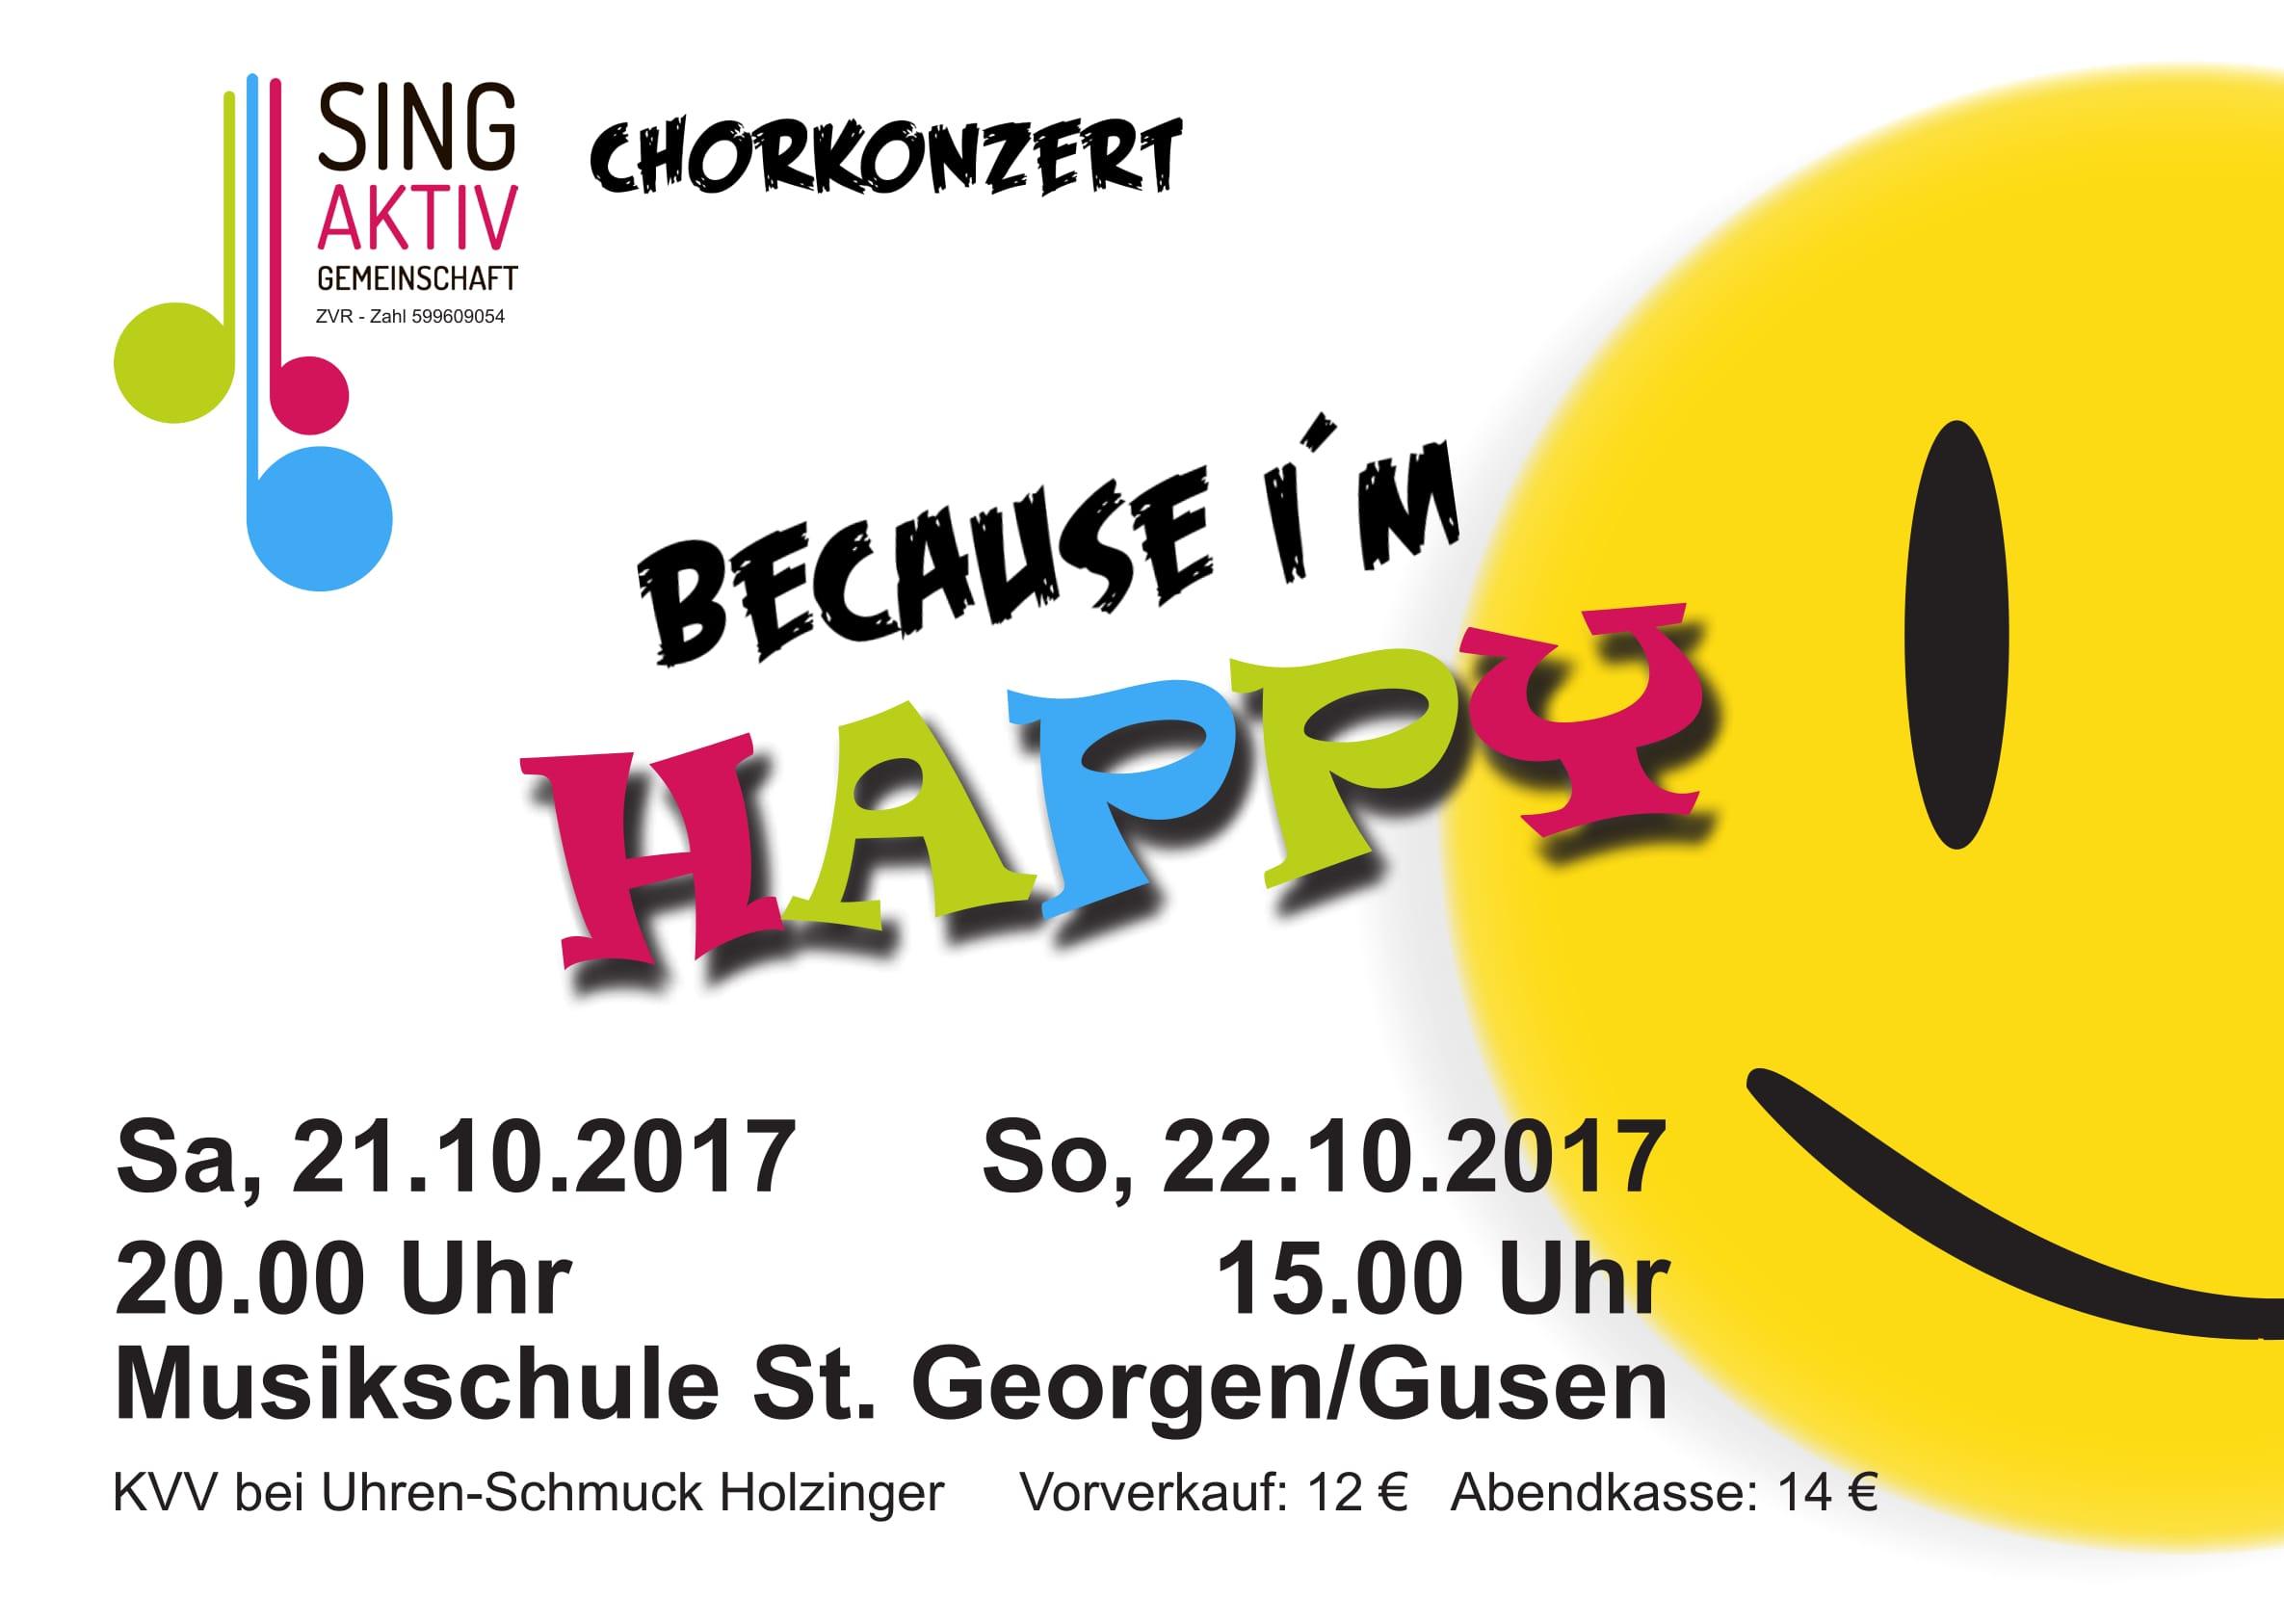 SingAG-Herbstkonzert-2017 Happy quer-1